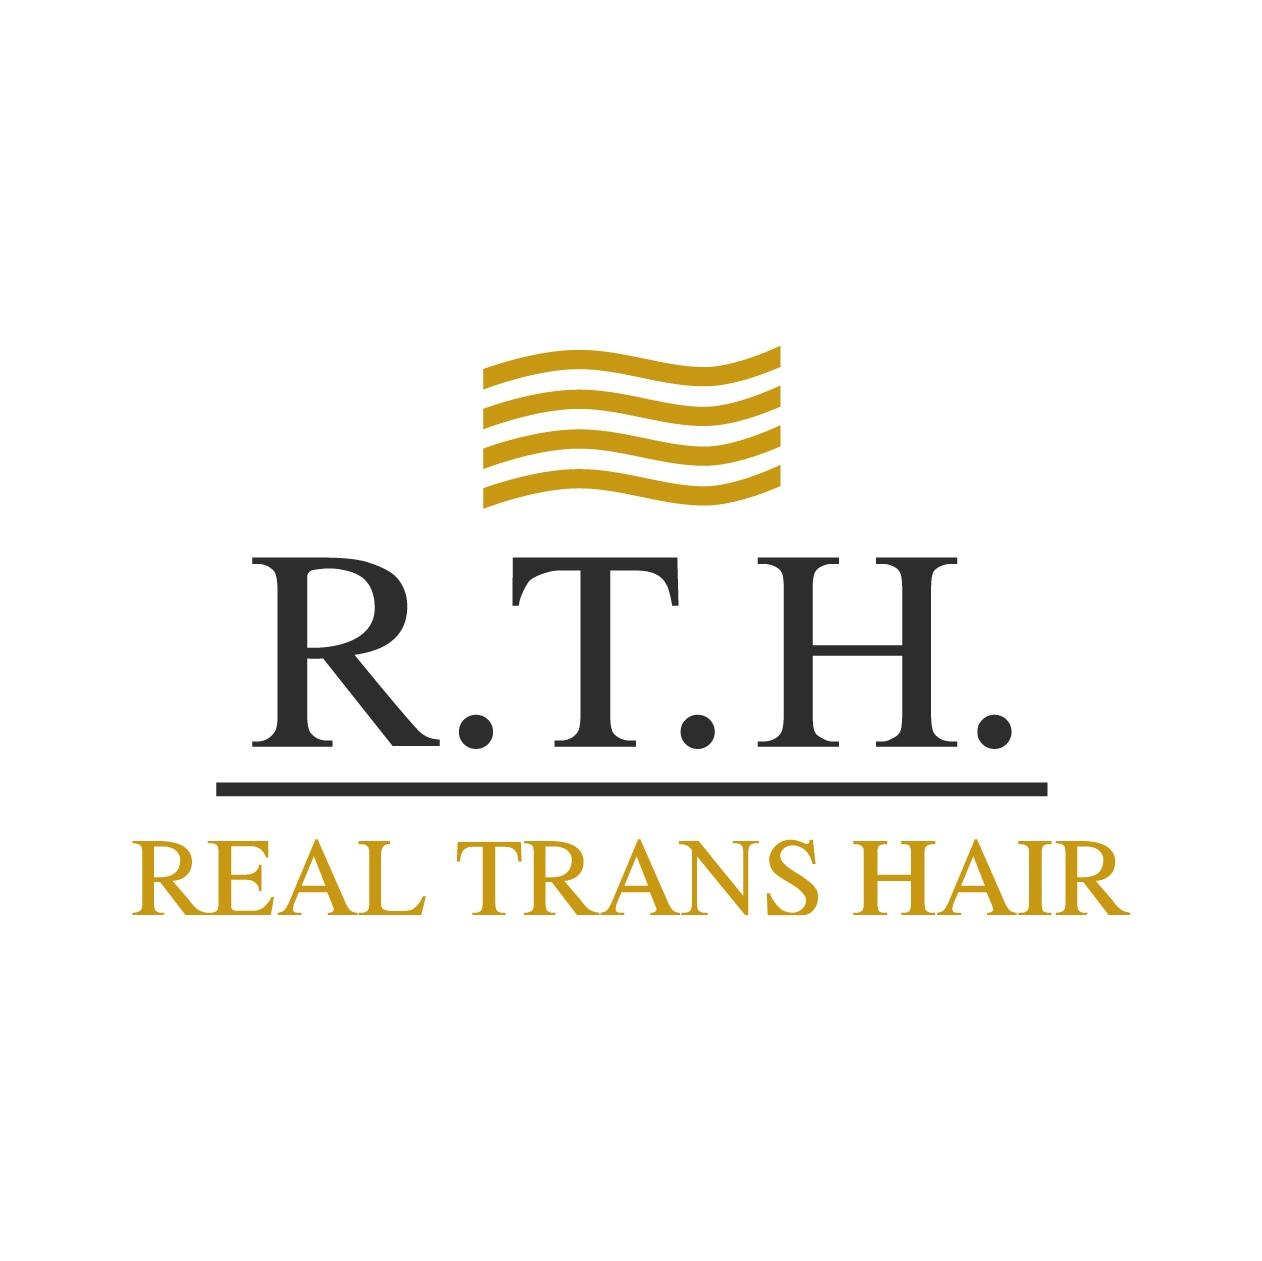 R.T.H. — REAL TRANS HAIR